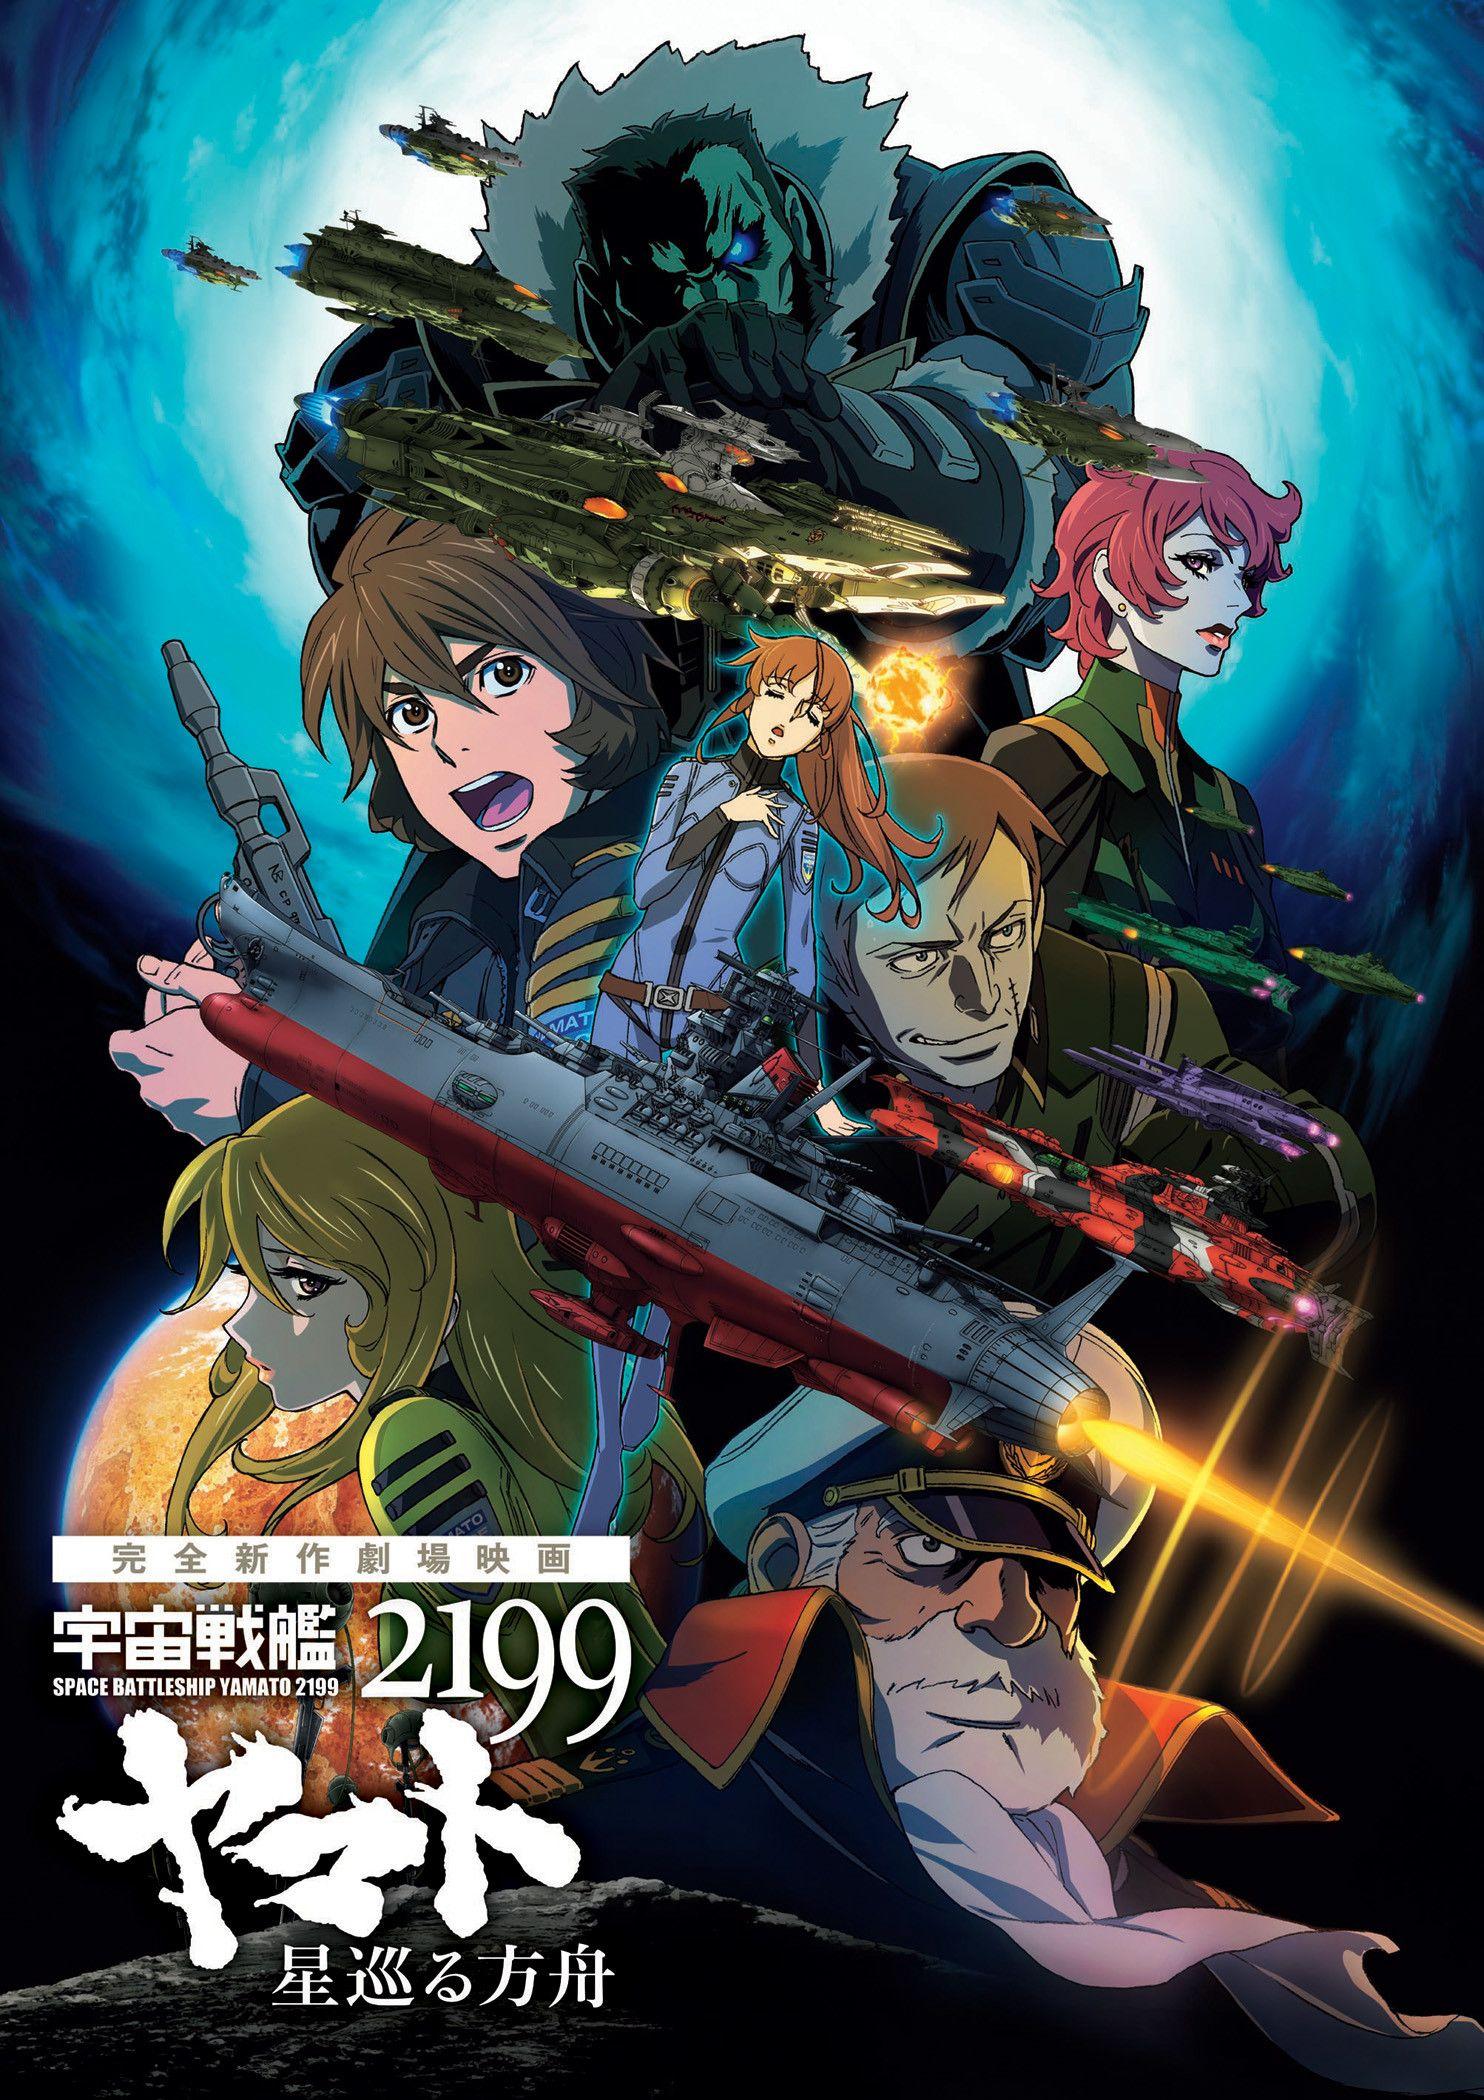 Space Battleship Yamato 2199 Wallpaper 86 Images Seni Manga